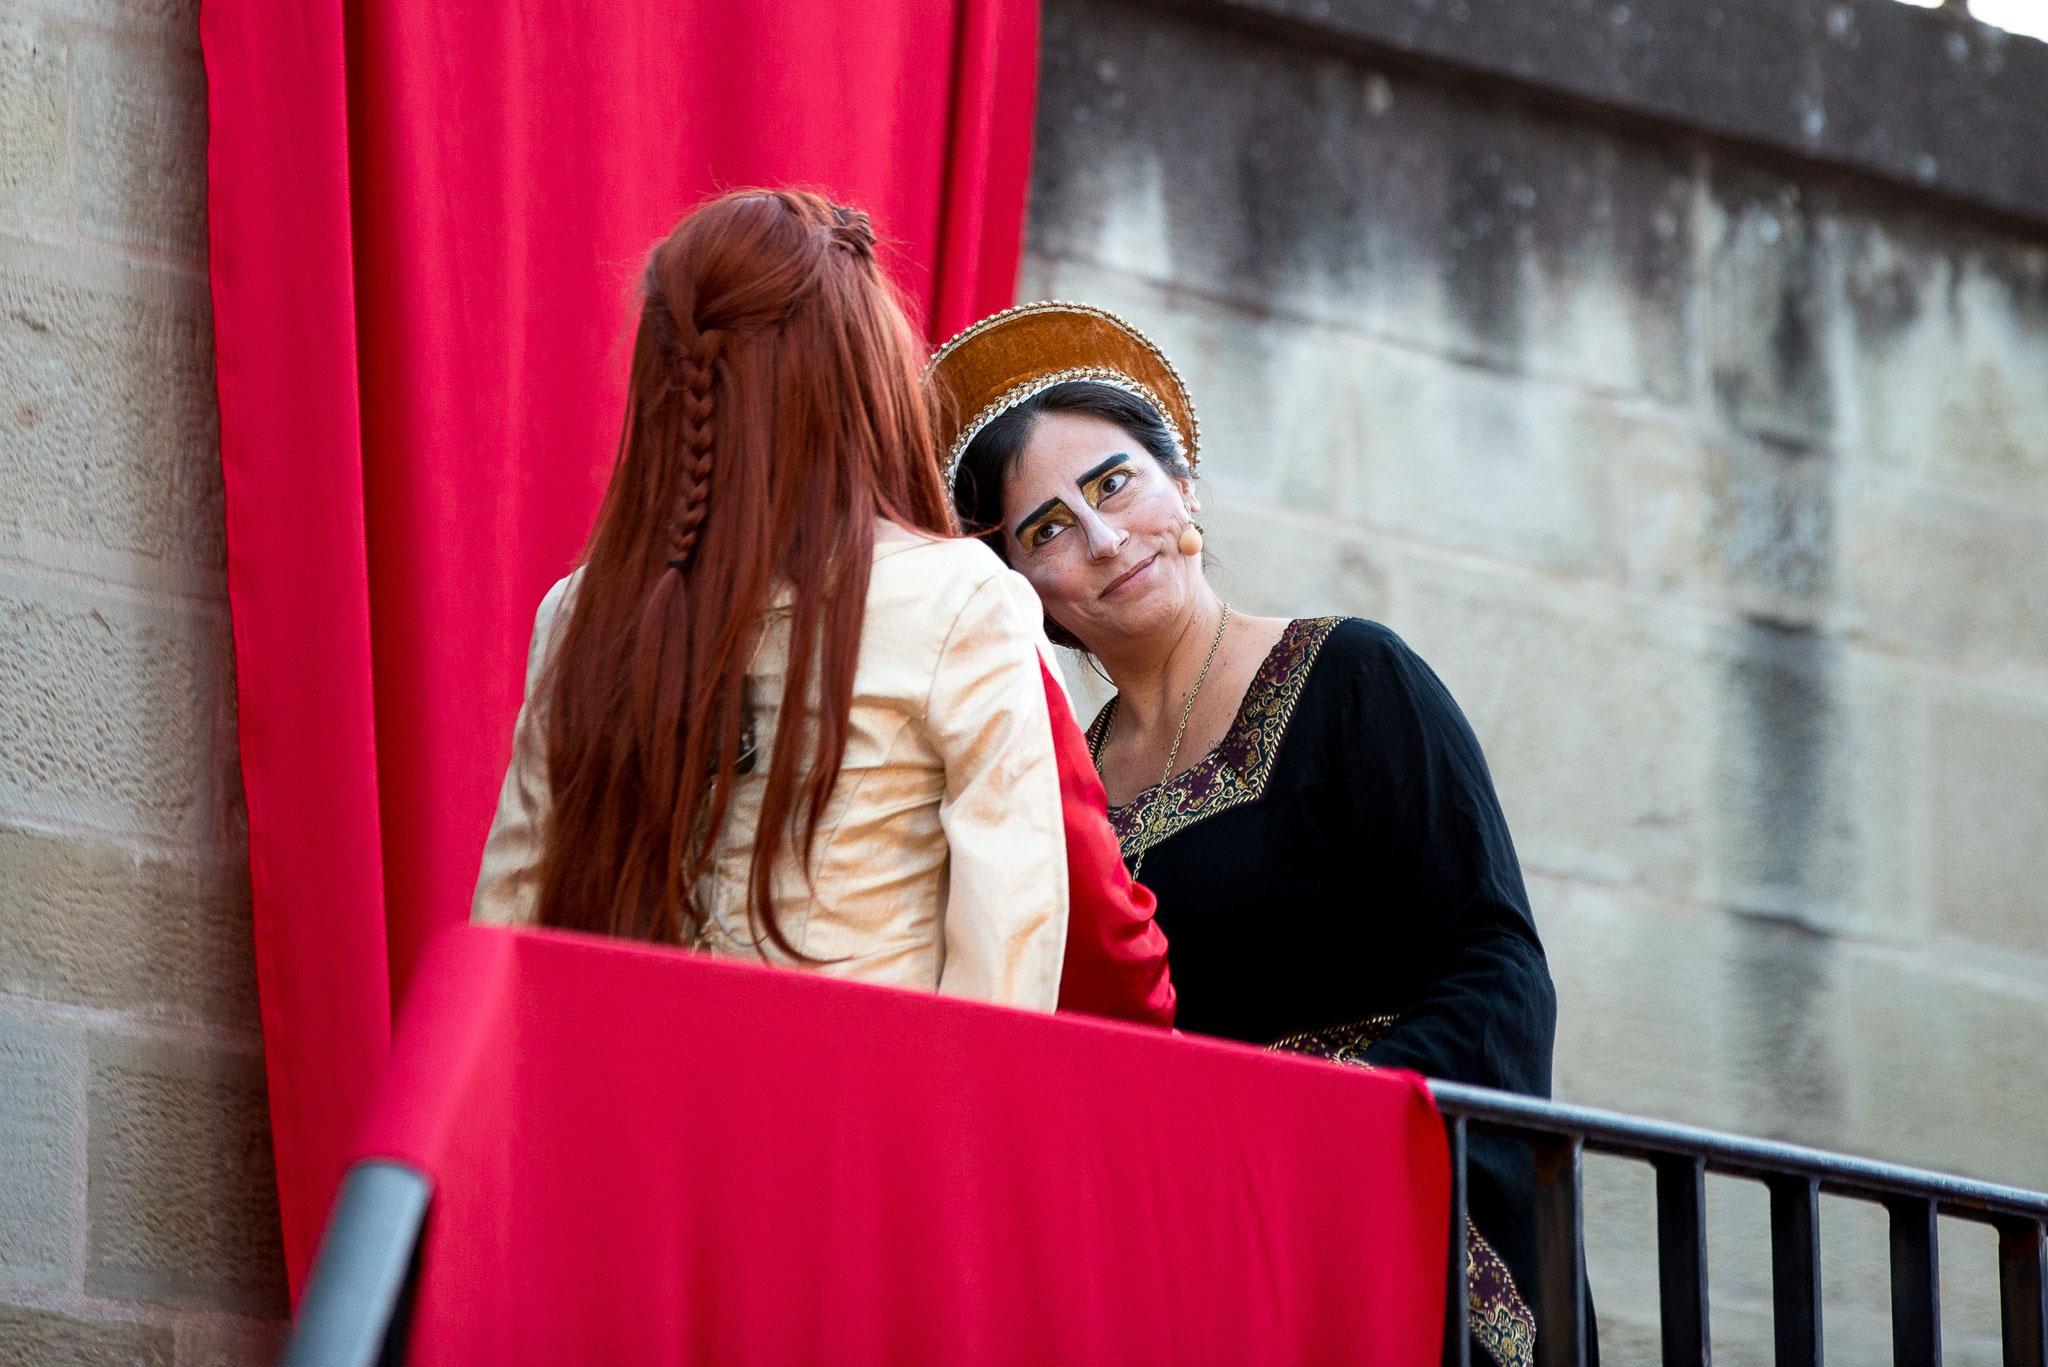 2014: Königin in Die Nibelungen